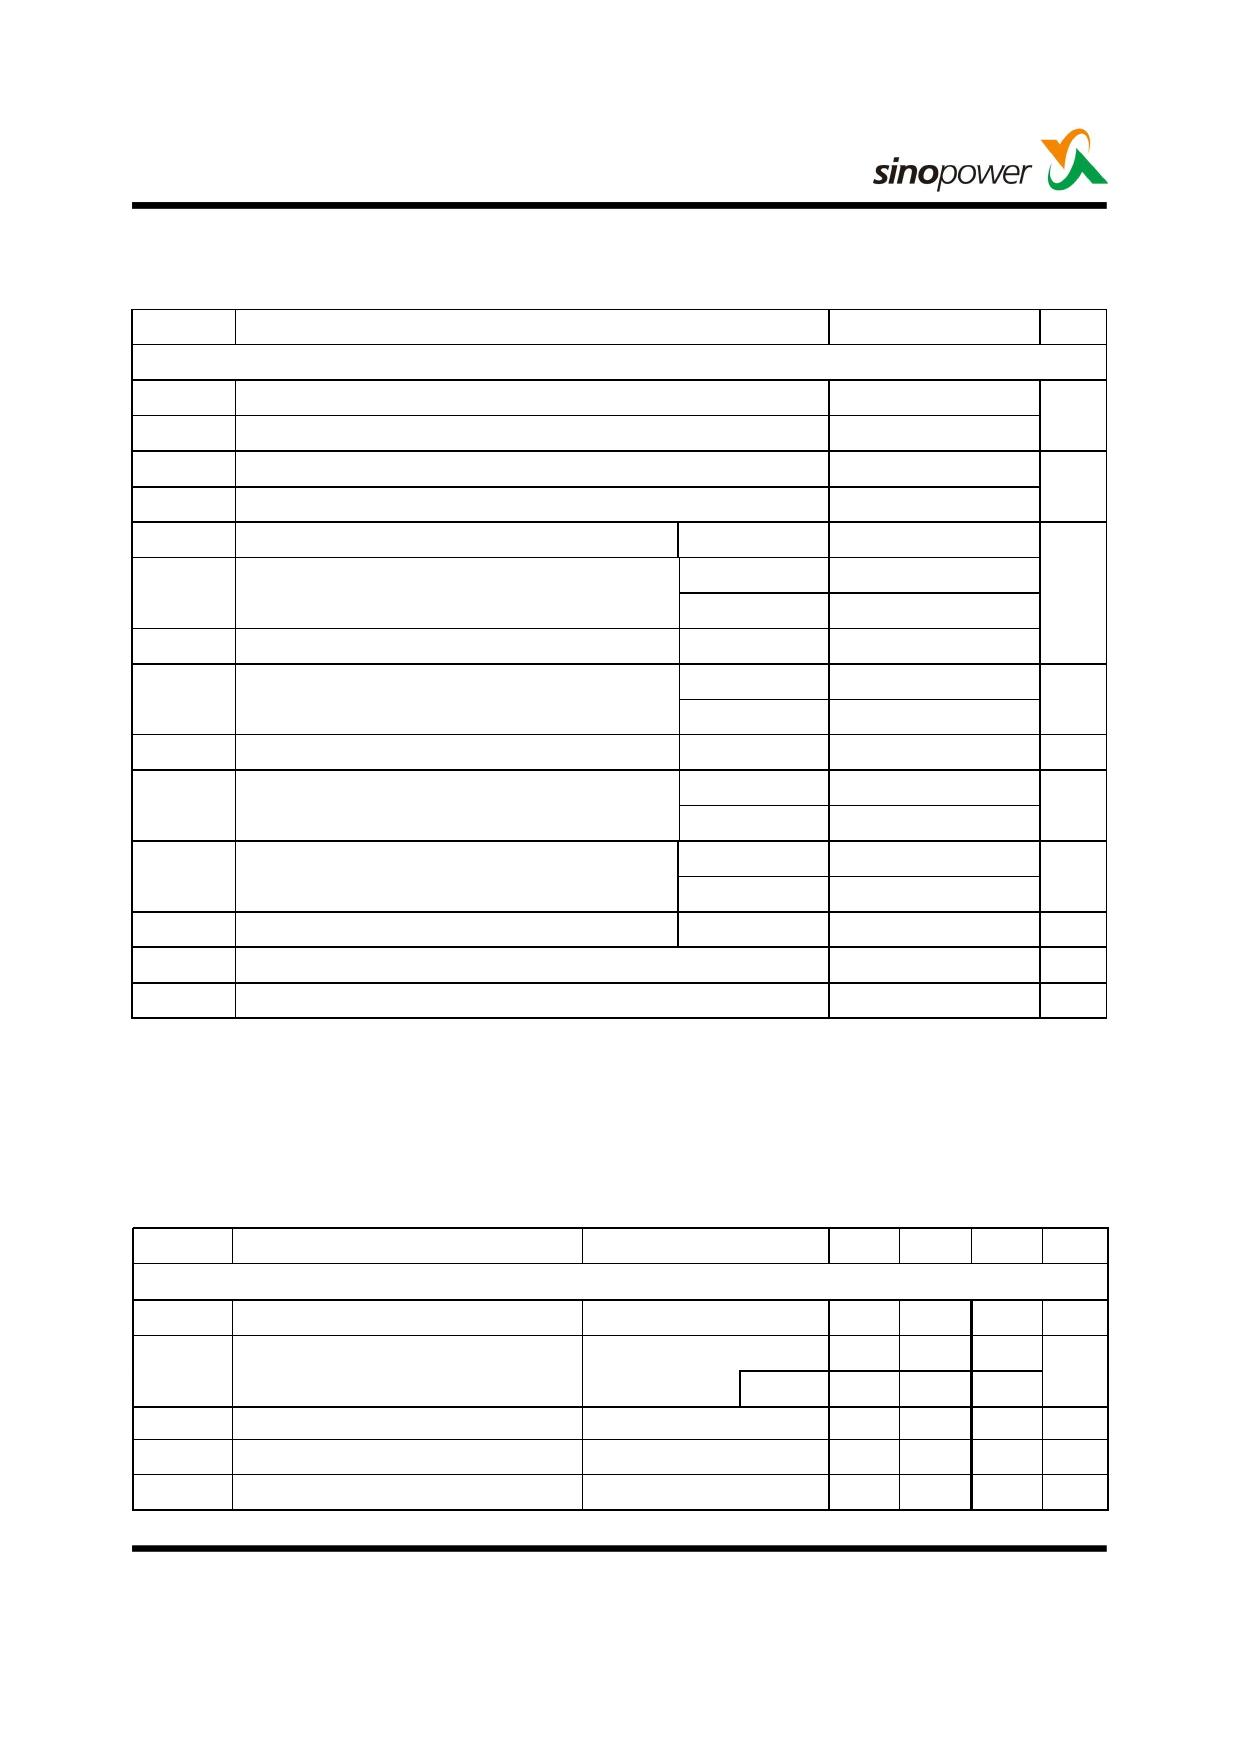 SM7508NSF pdf, equivalent, schematic